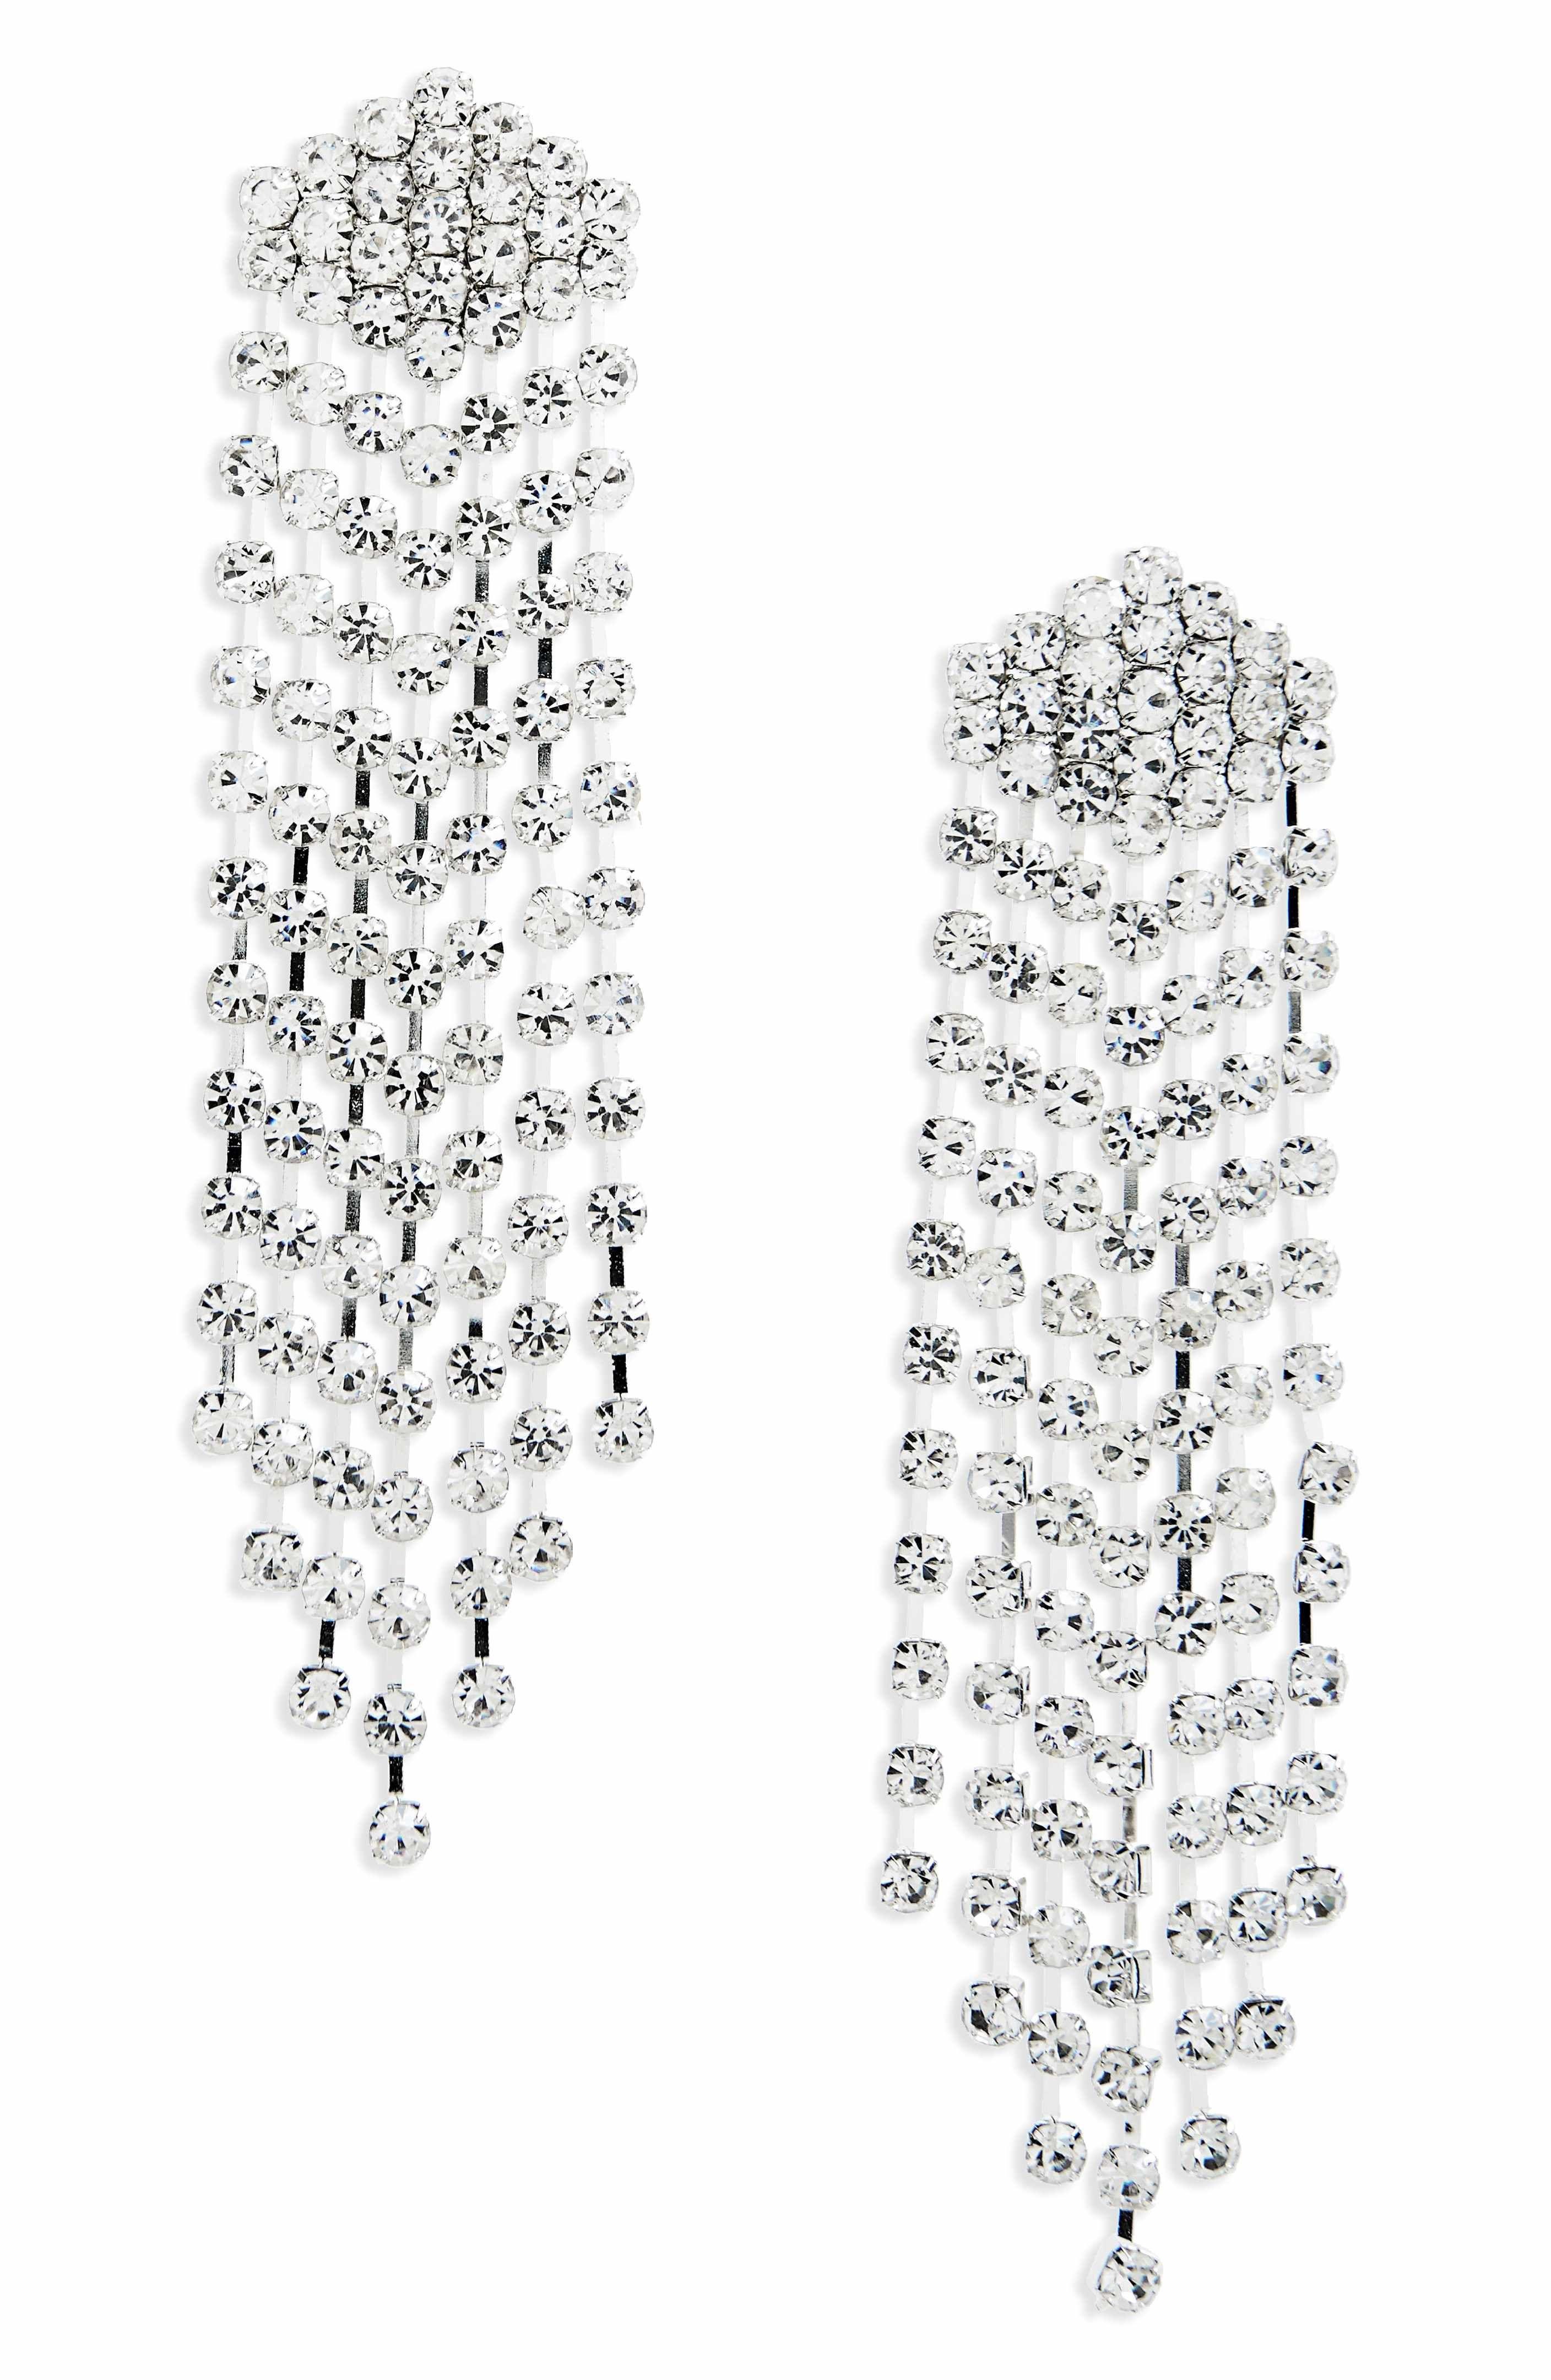 Natasha crystal chandelier earrings talk about statement earrings natasha crystal chandelier earrings talk about statement earrings spotted nordstrom arubaitofo Choice Image